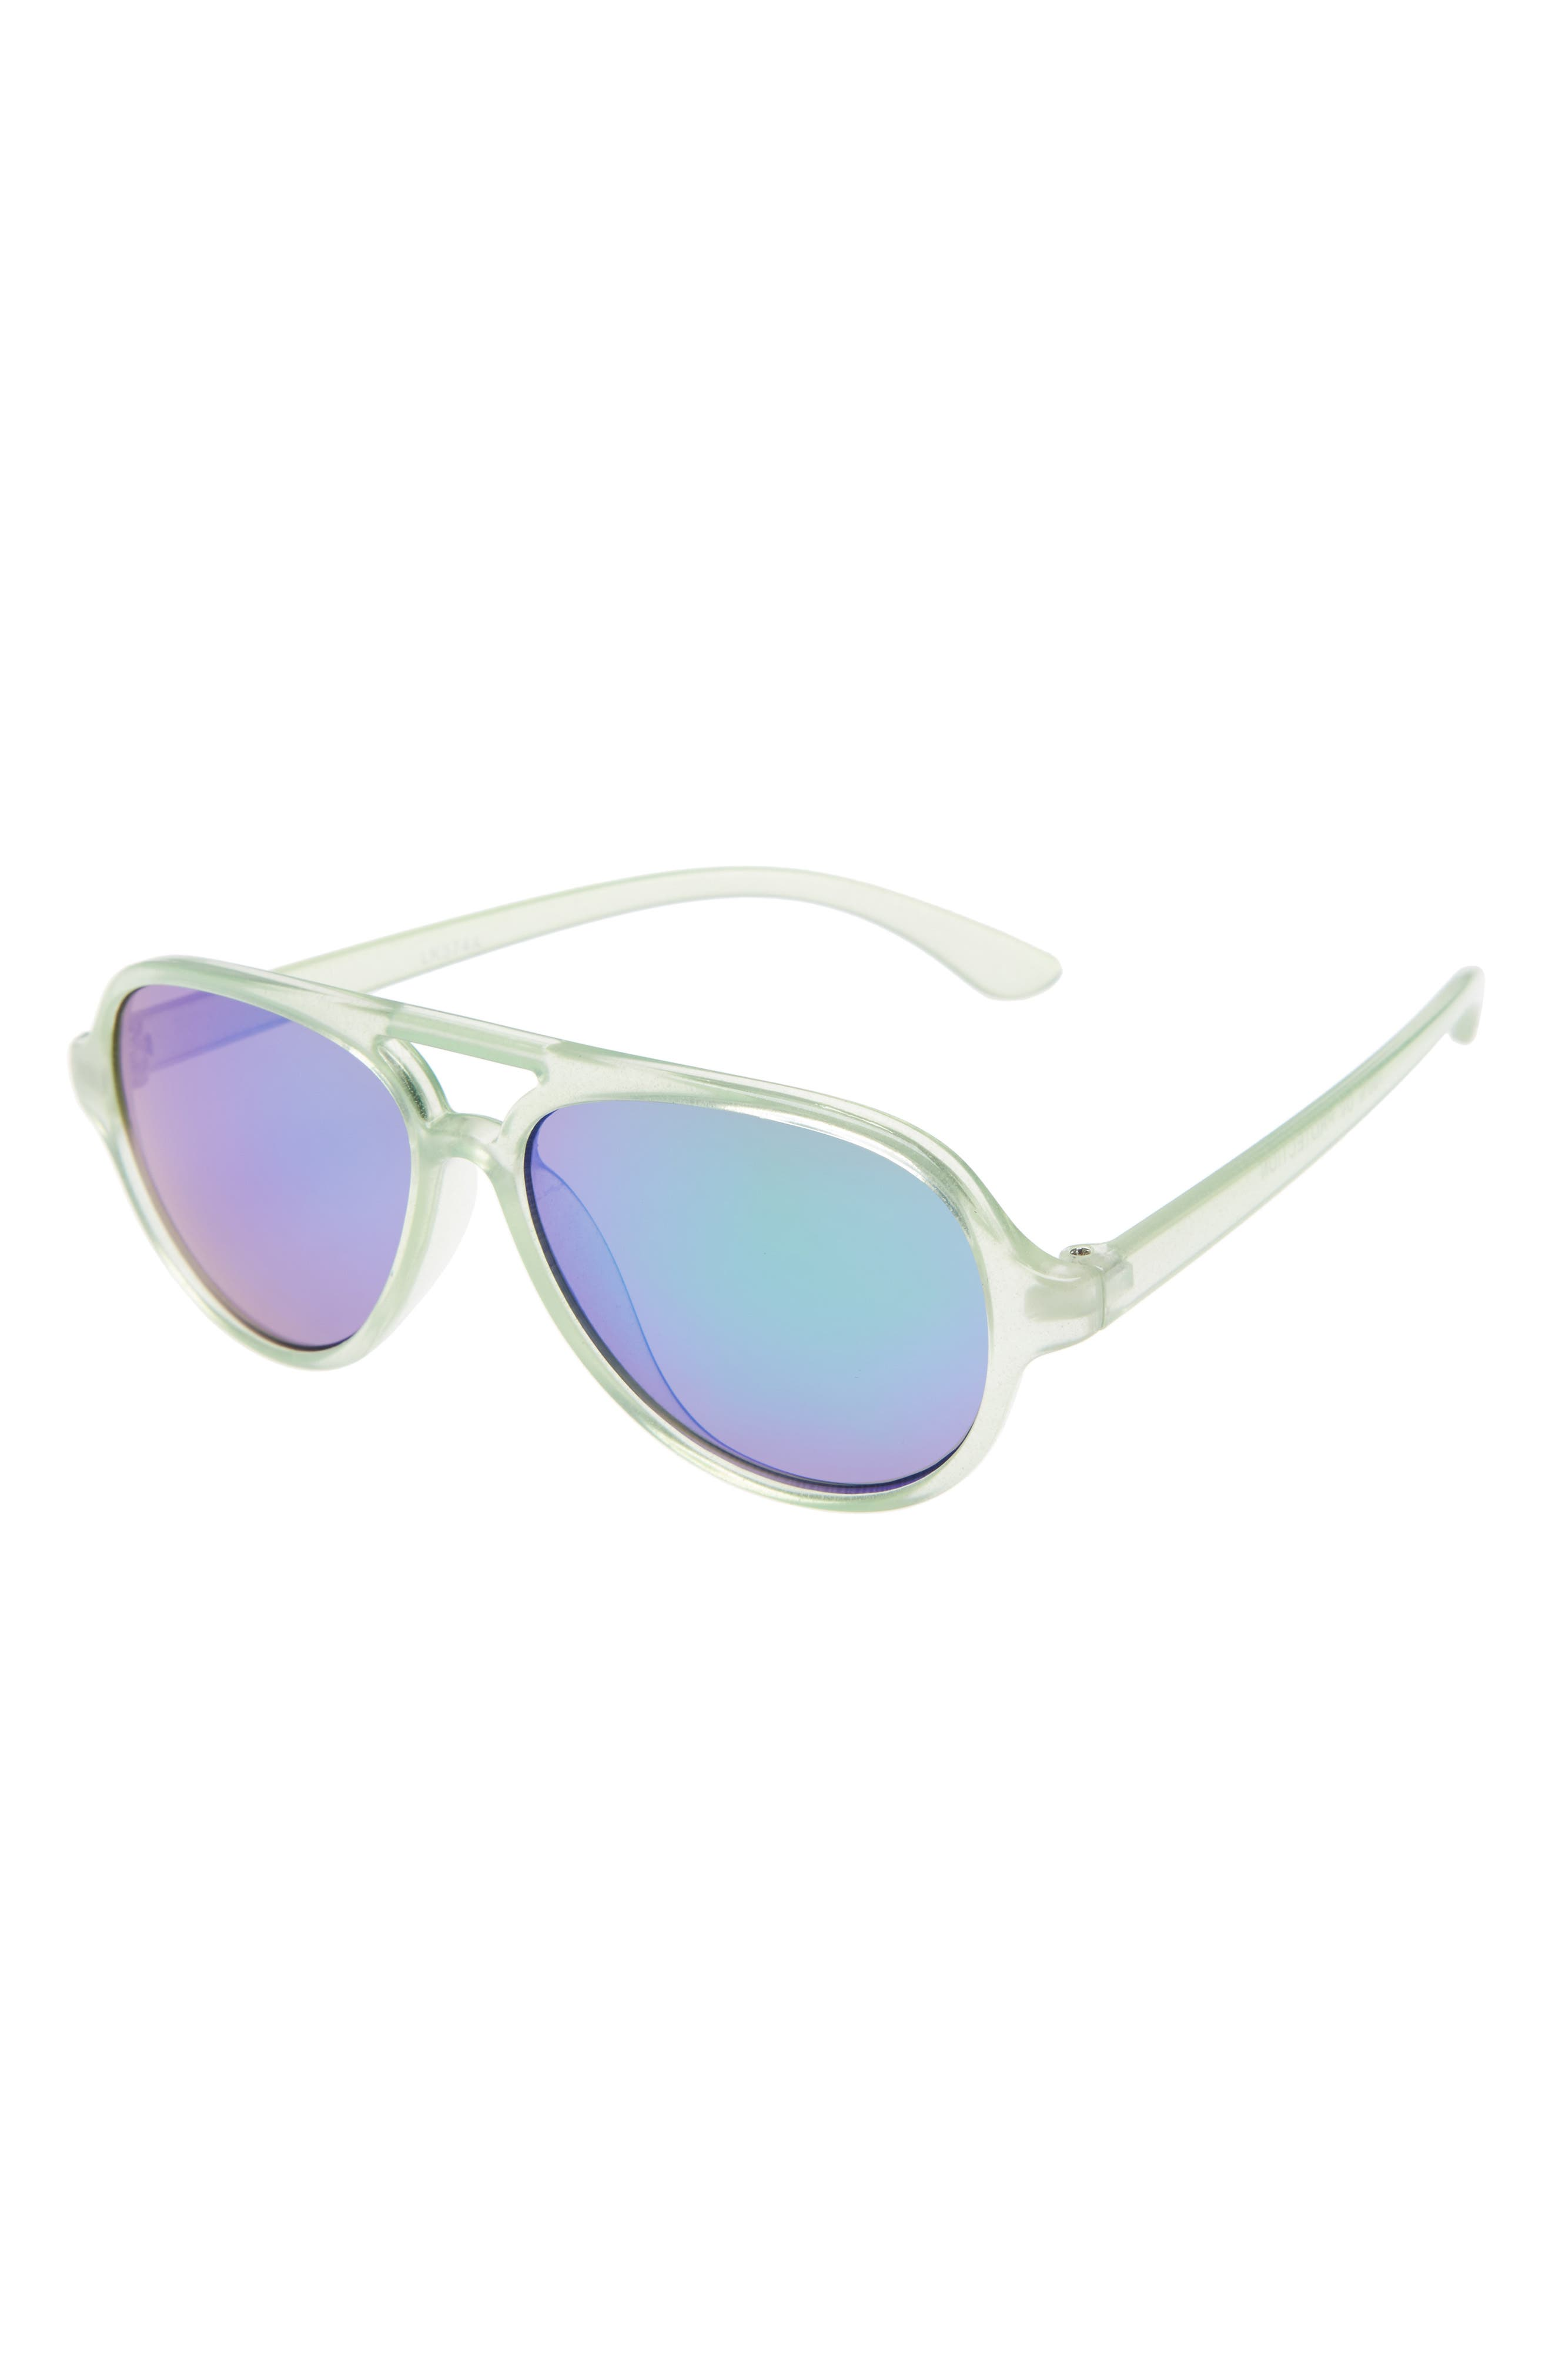 Loose Leaf Eyewear Carrera Glow in the Dark Sunglasses (Baby)